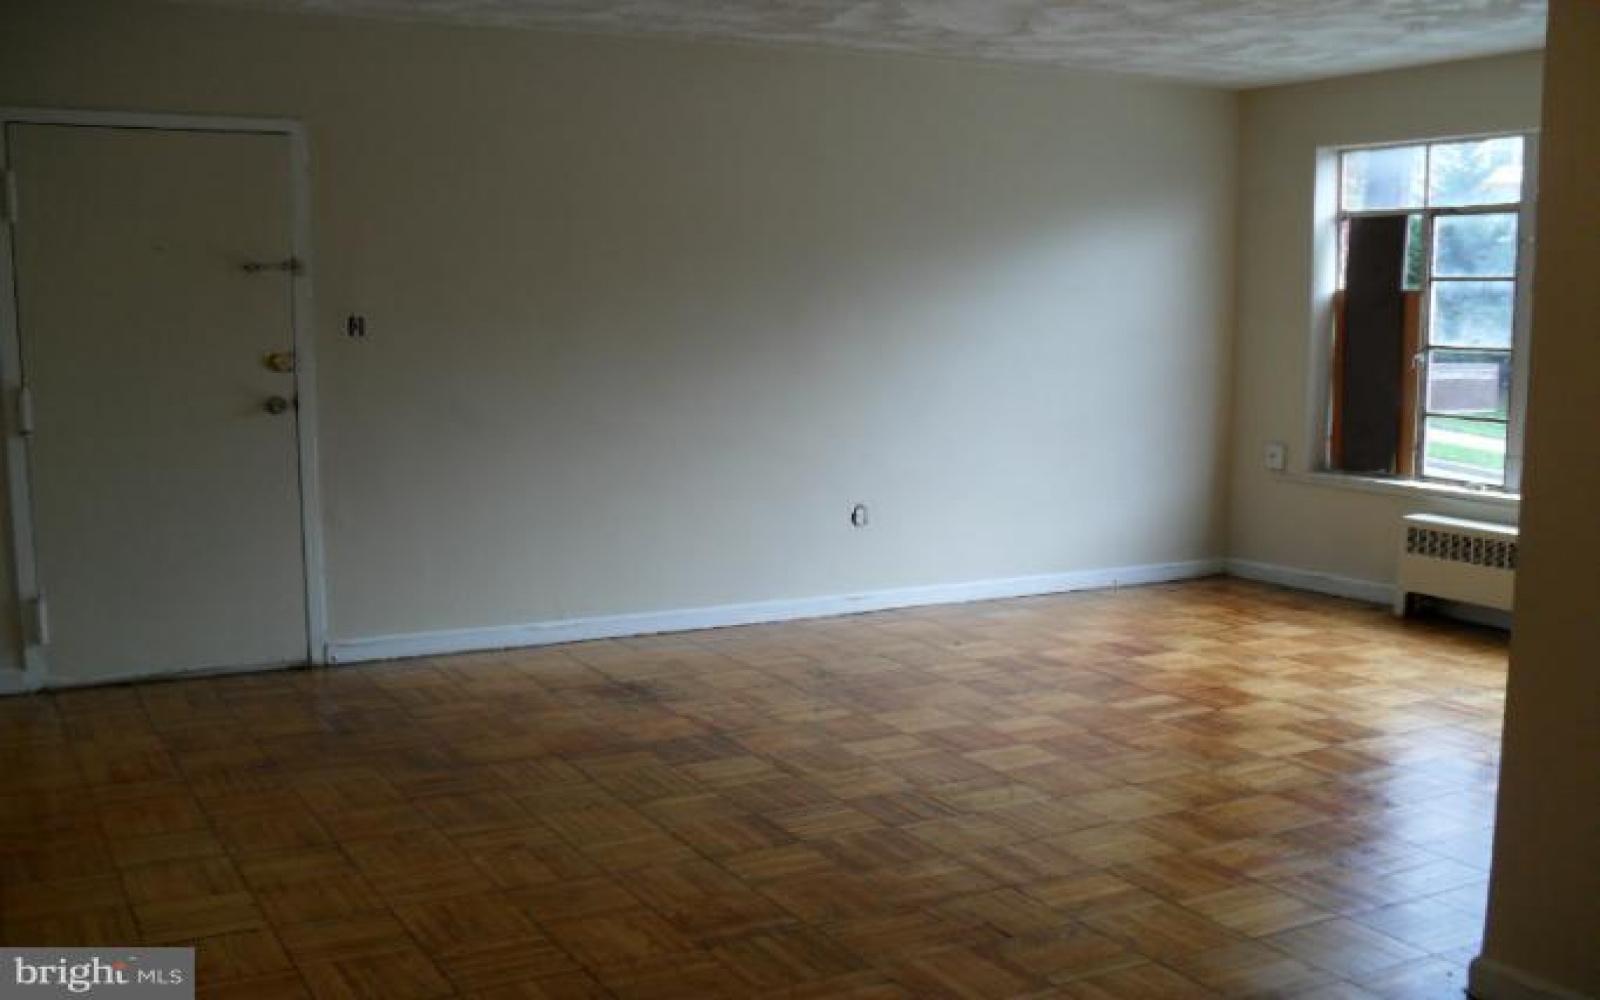 2400 Good Hope Rd SE,Washington,District Of Columbia 20020,1 Bedroom Bedrooms,1 BathroomBathrooms,Apartment,Good Hope,1202